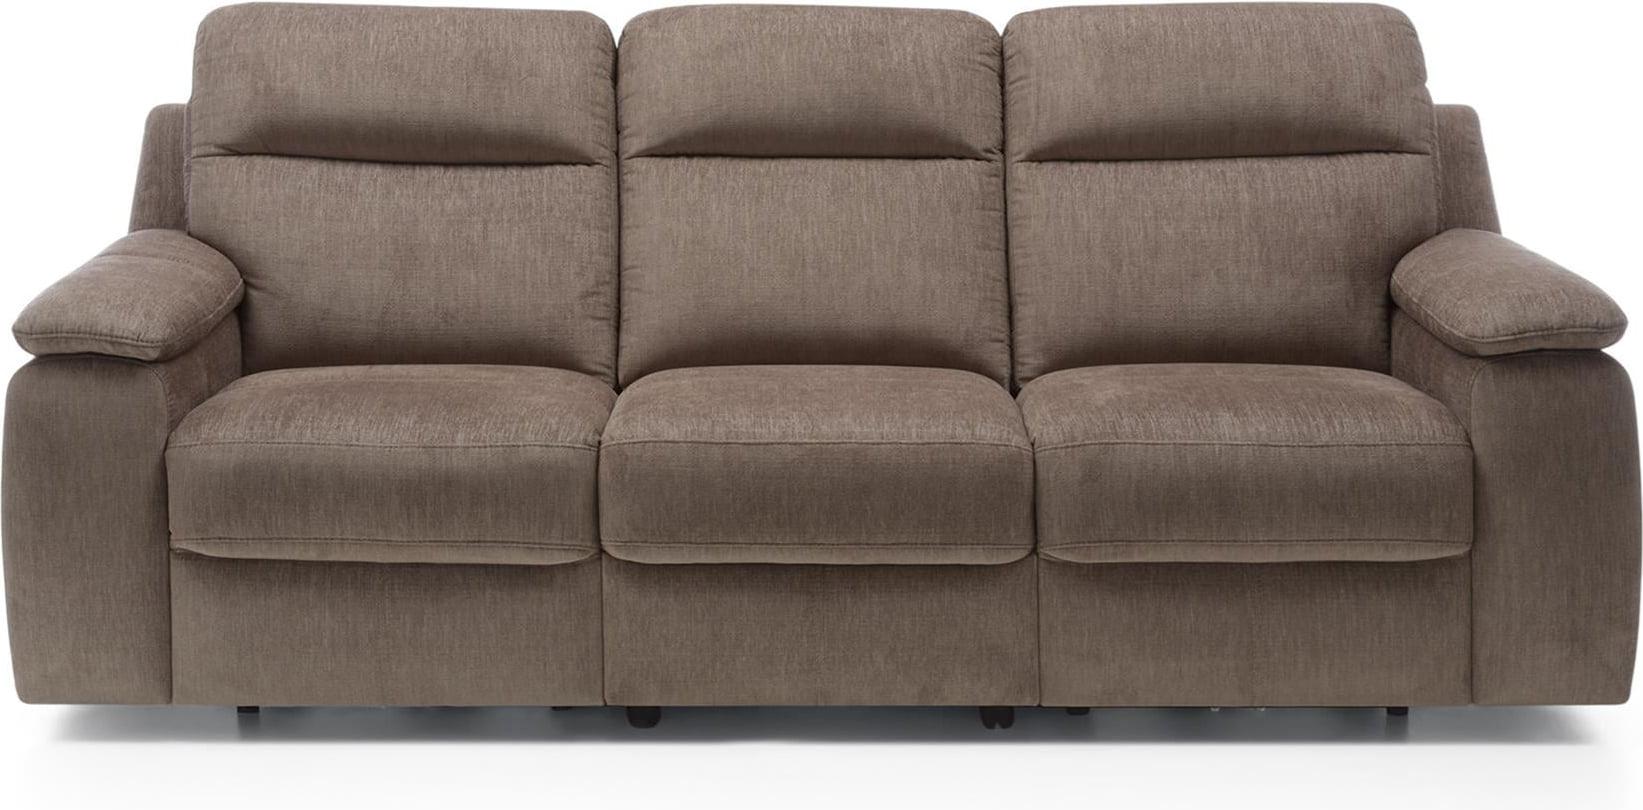 Sofa z funkcją relaksu manualnego Libretto